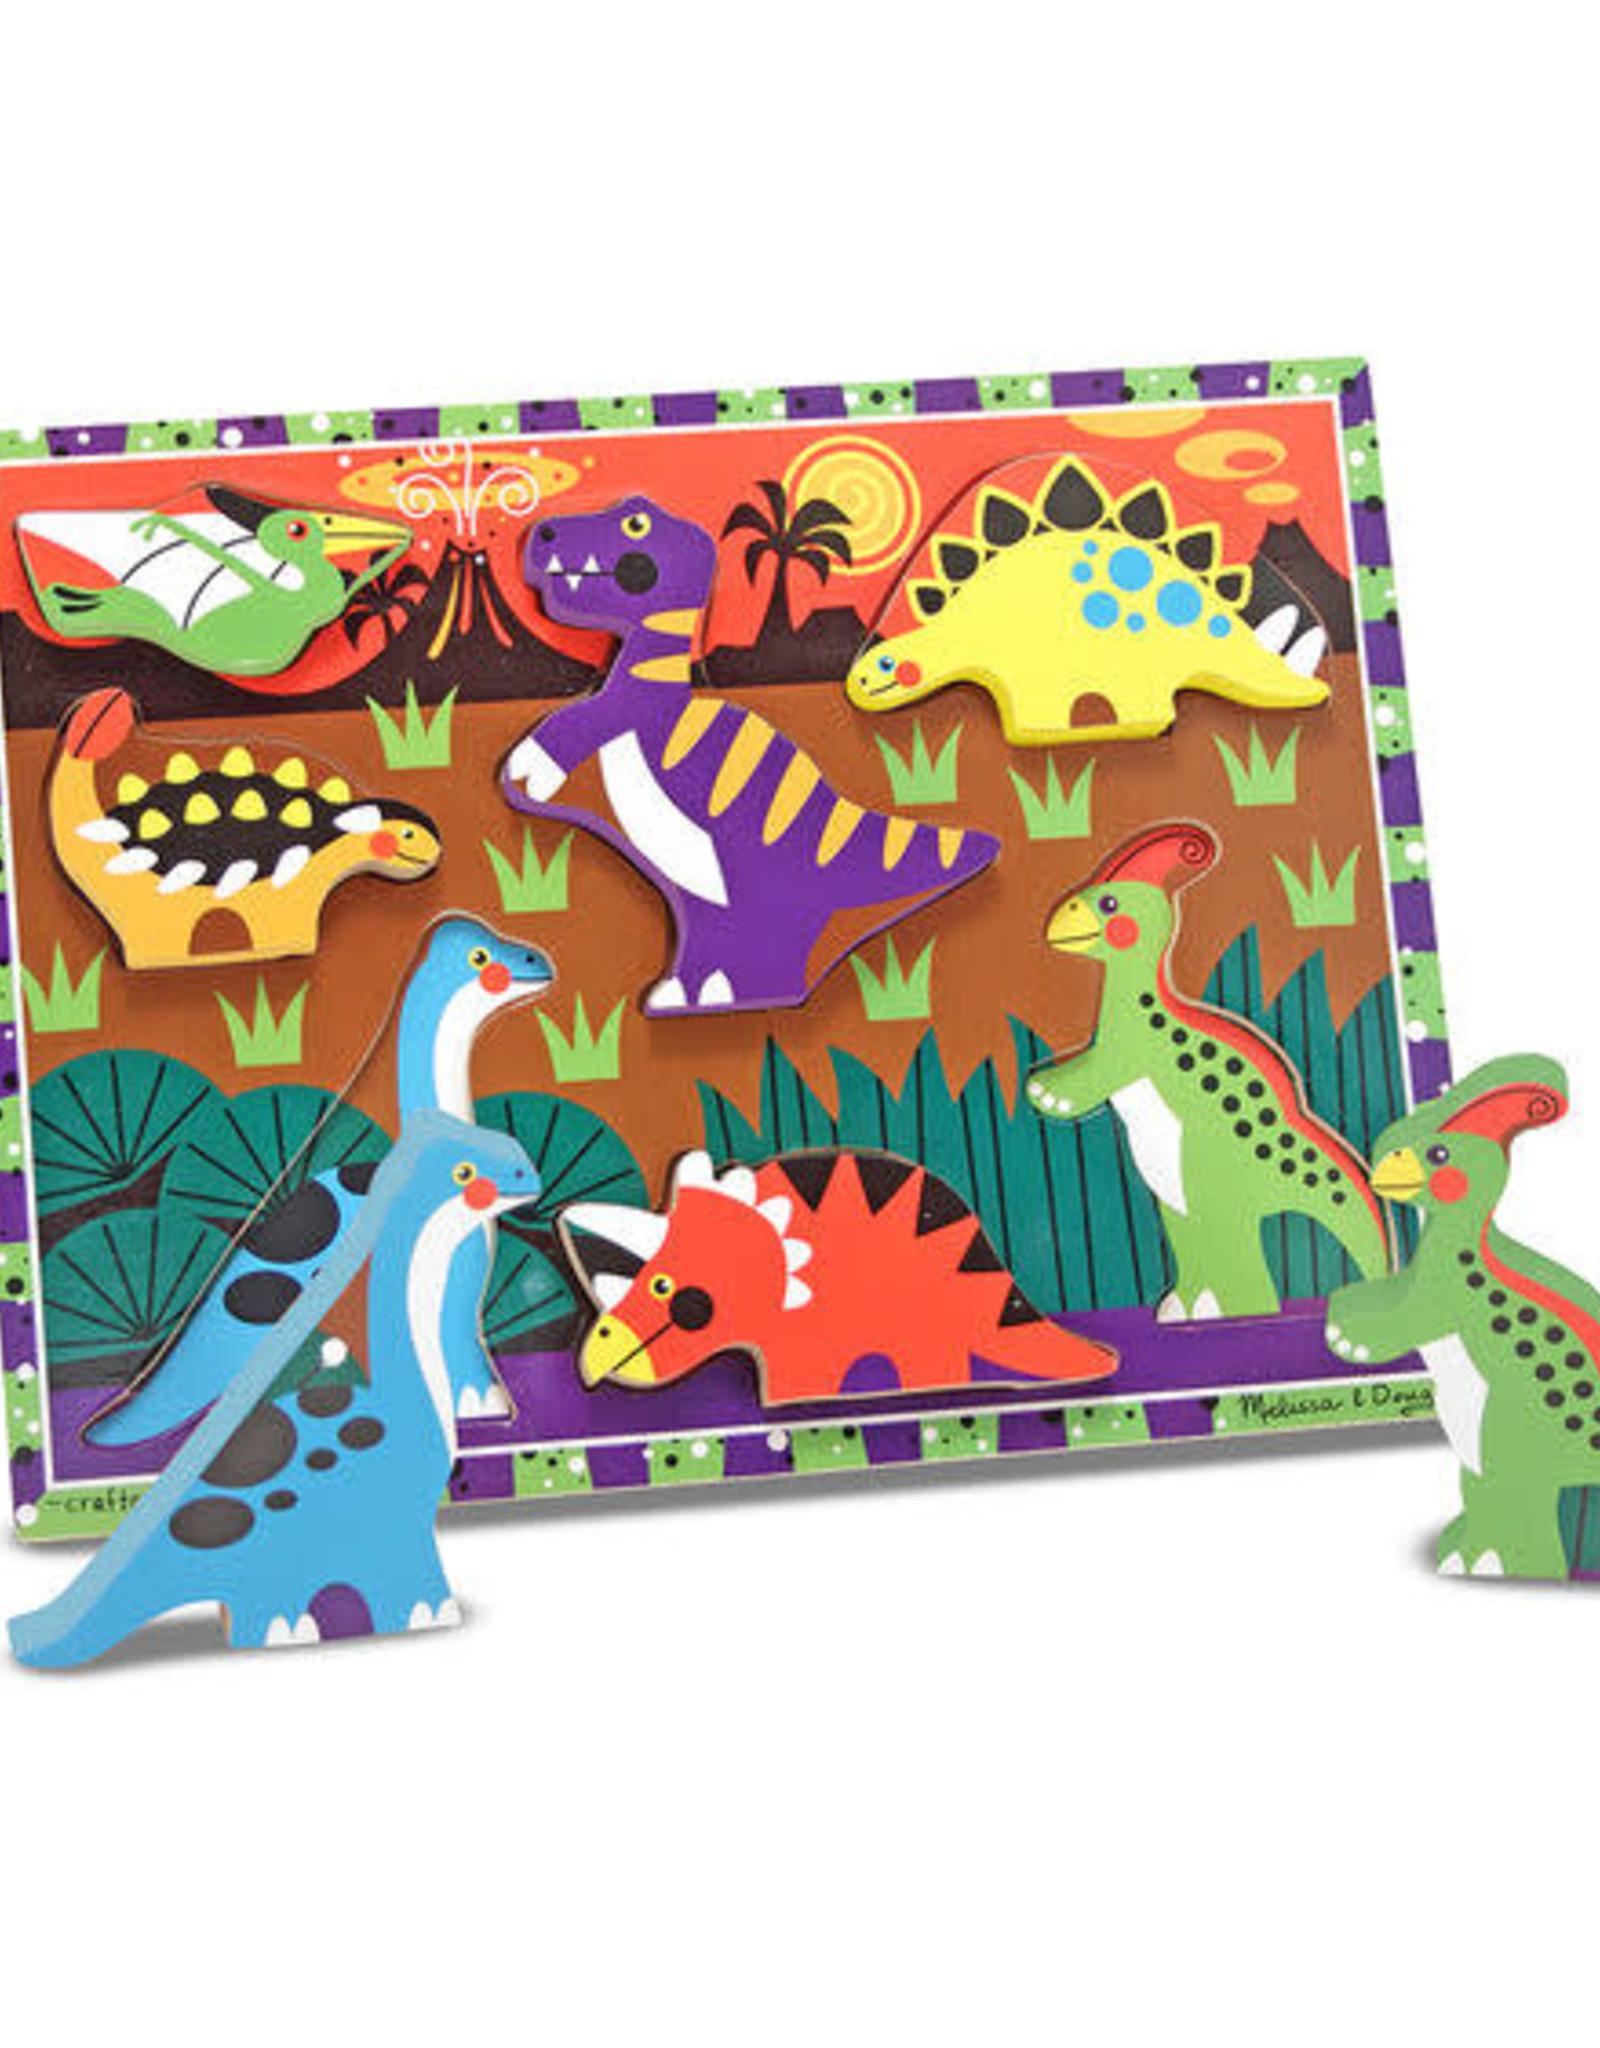 Melissa & Doug MD Chunky Puzzle Dinosaurs